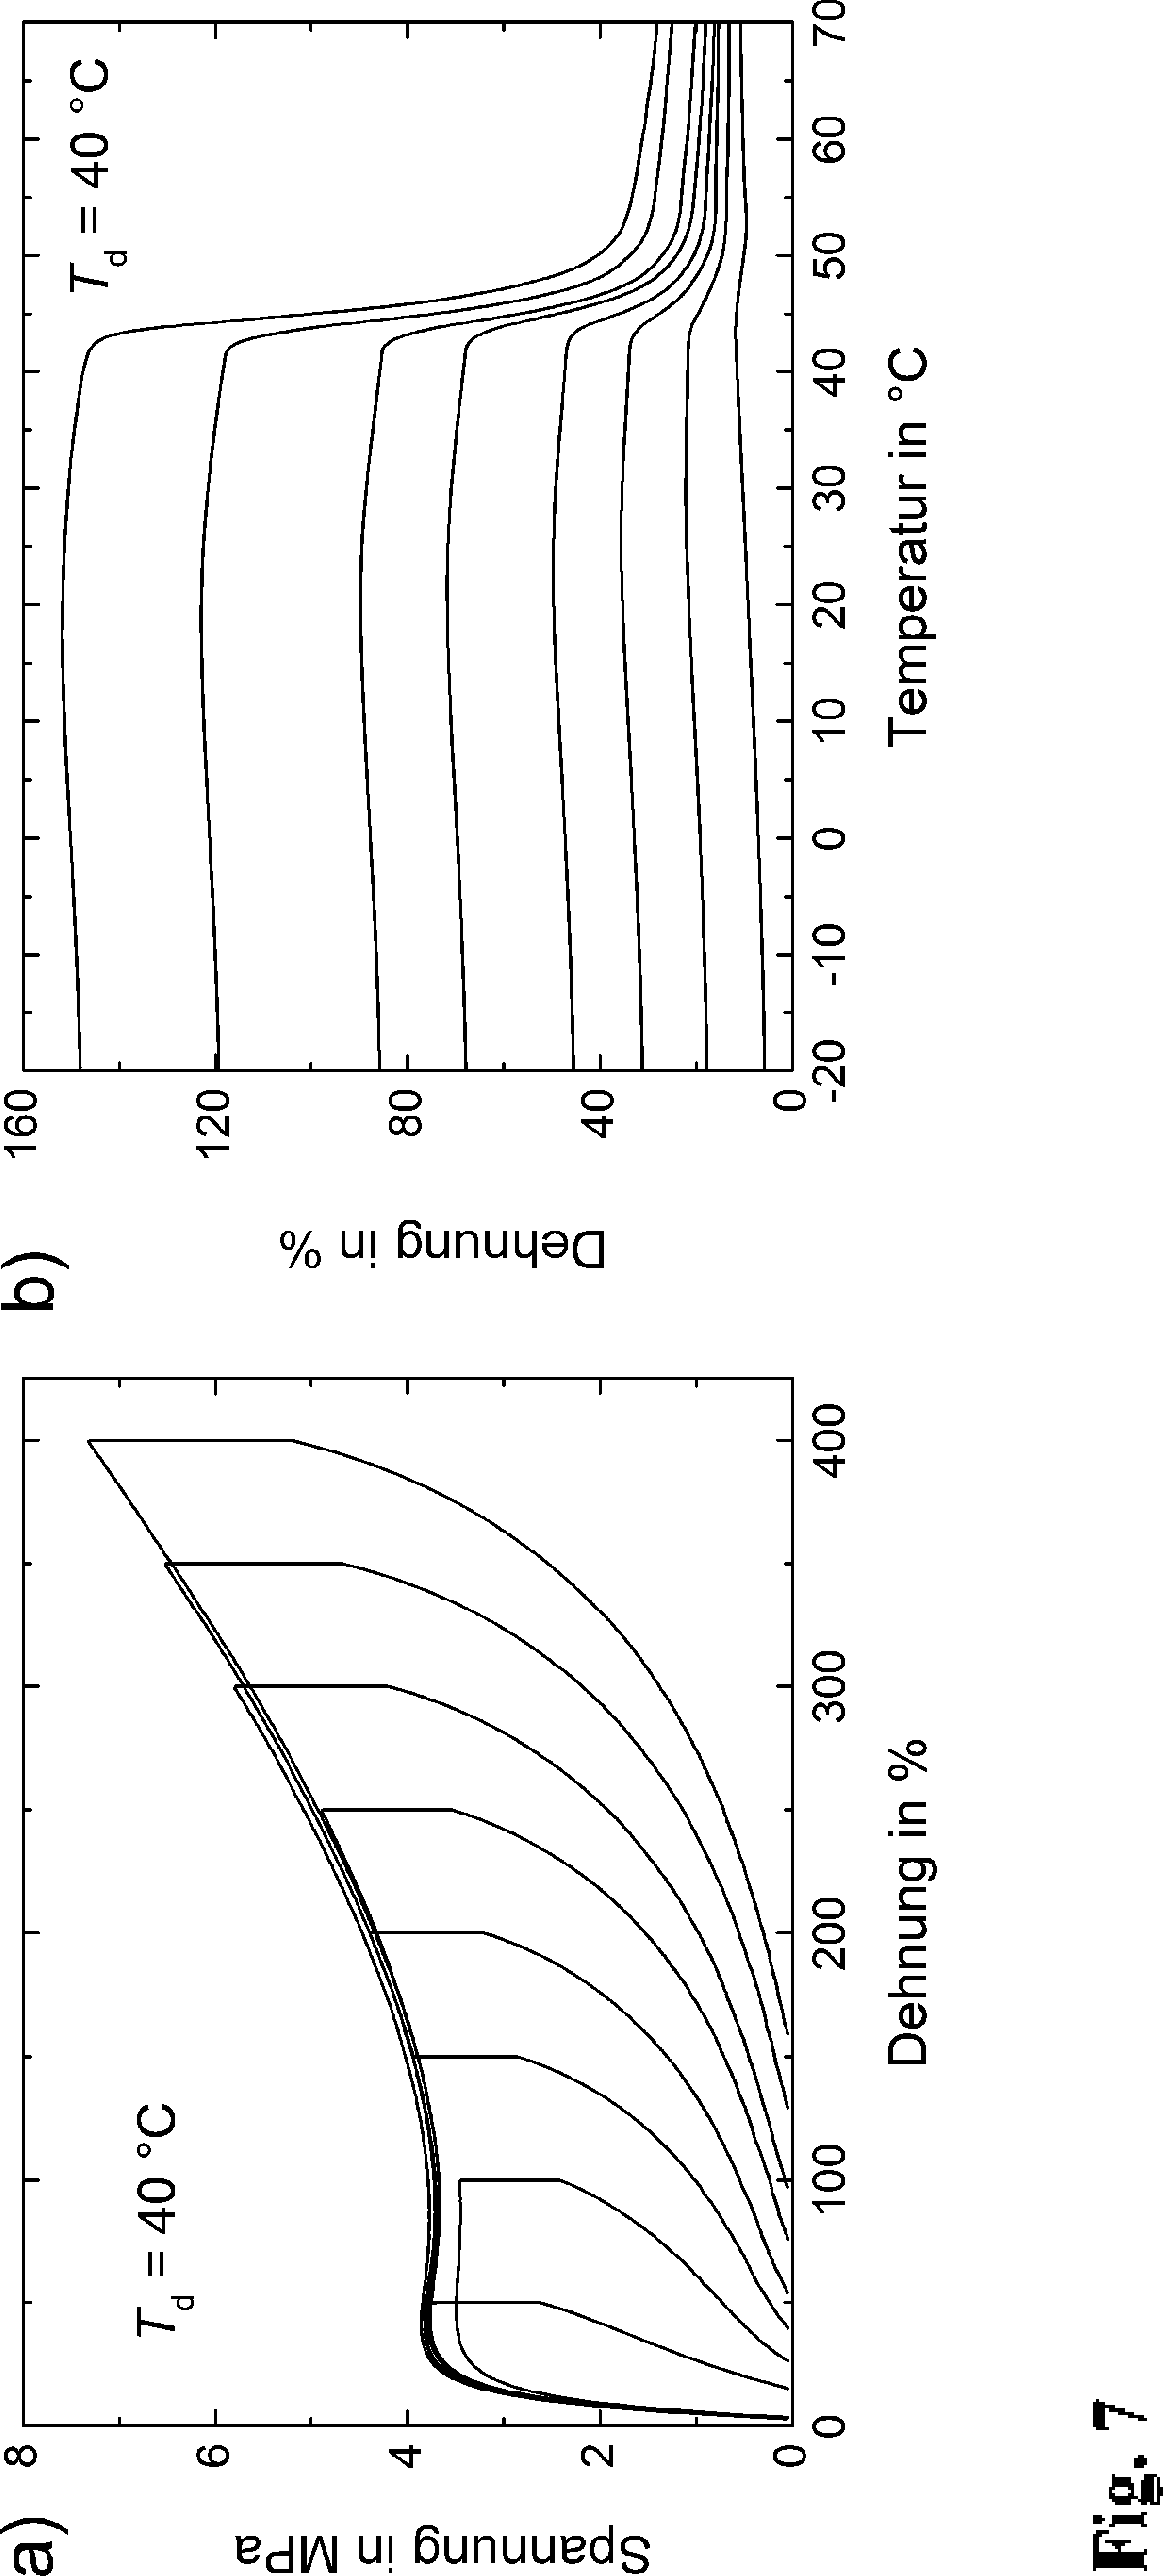 Nett Schematische Batterie Galerie - Schaltplan Serie Circuit ...